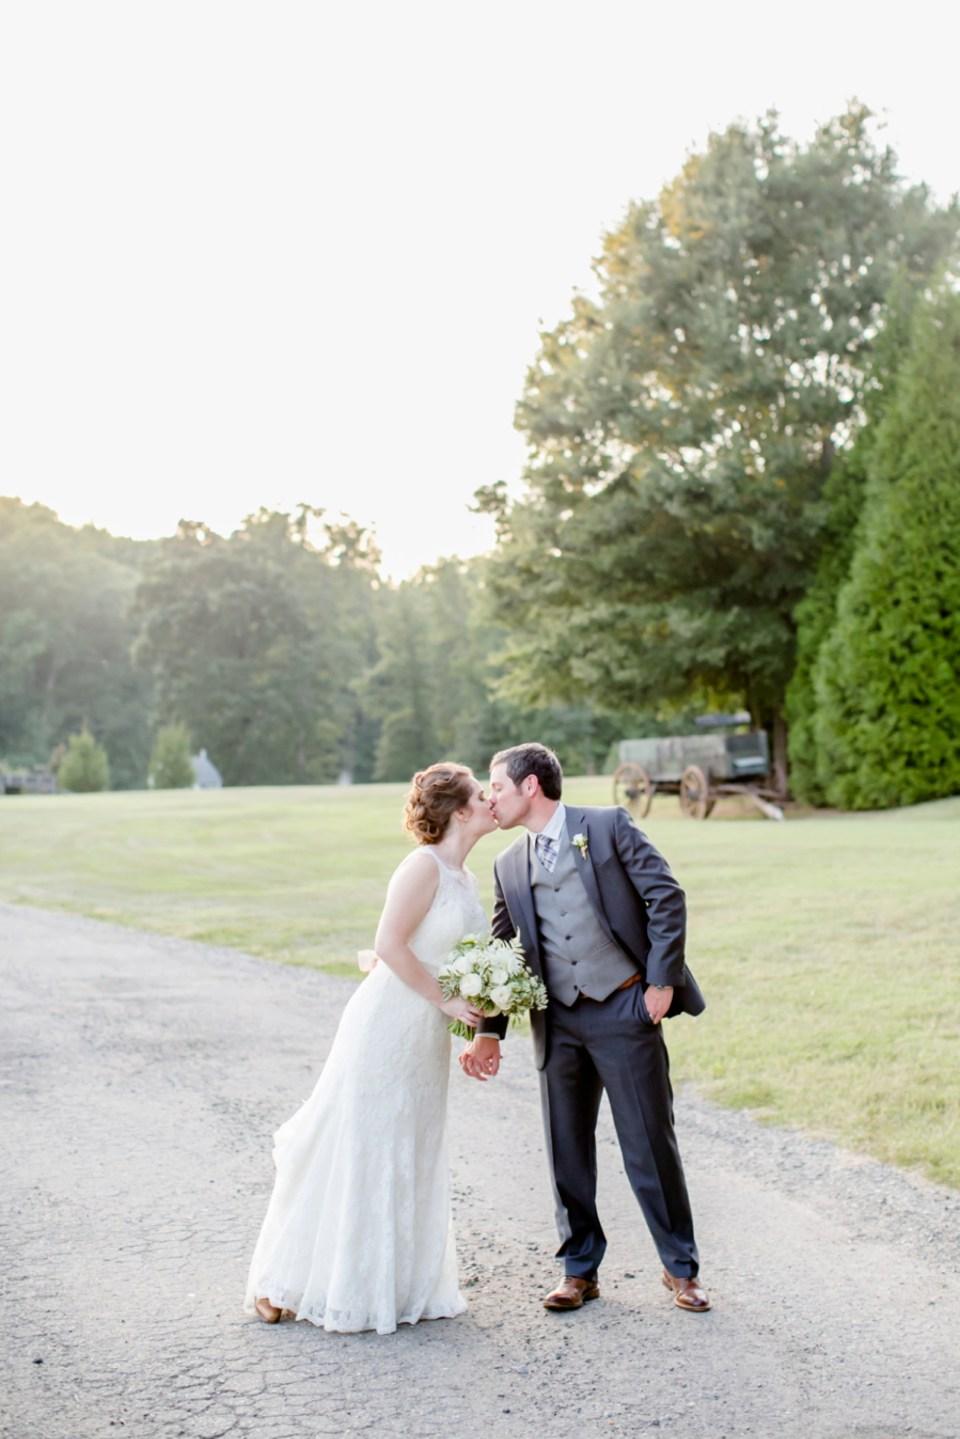 47a-stevenson-ridge-wedding-rustic-kaitlin-parker-1141